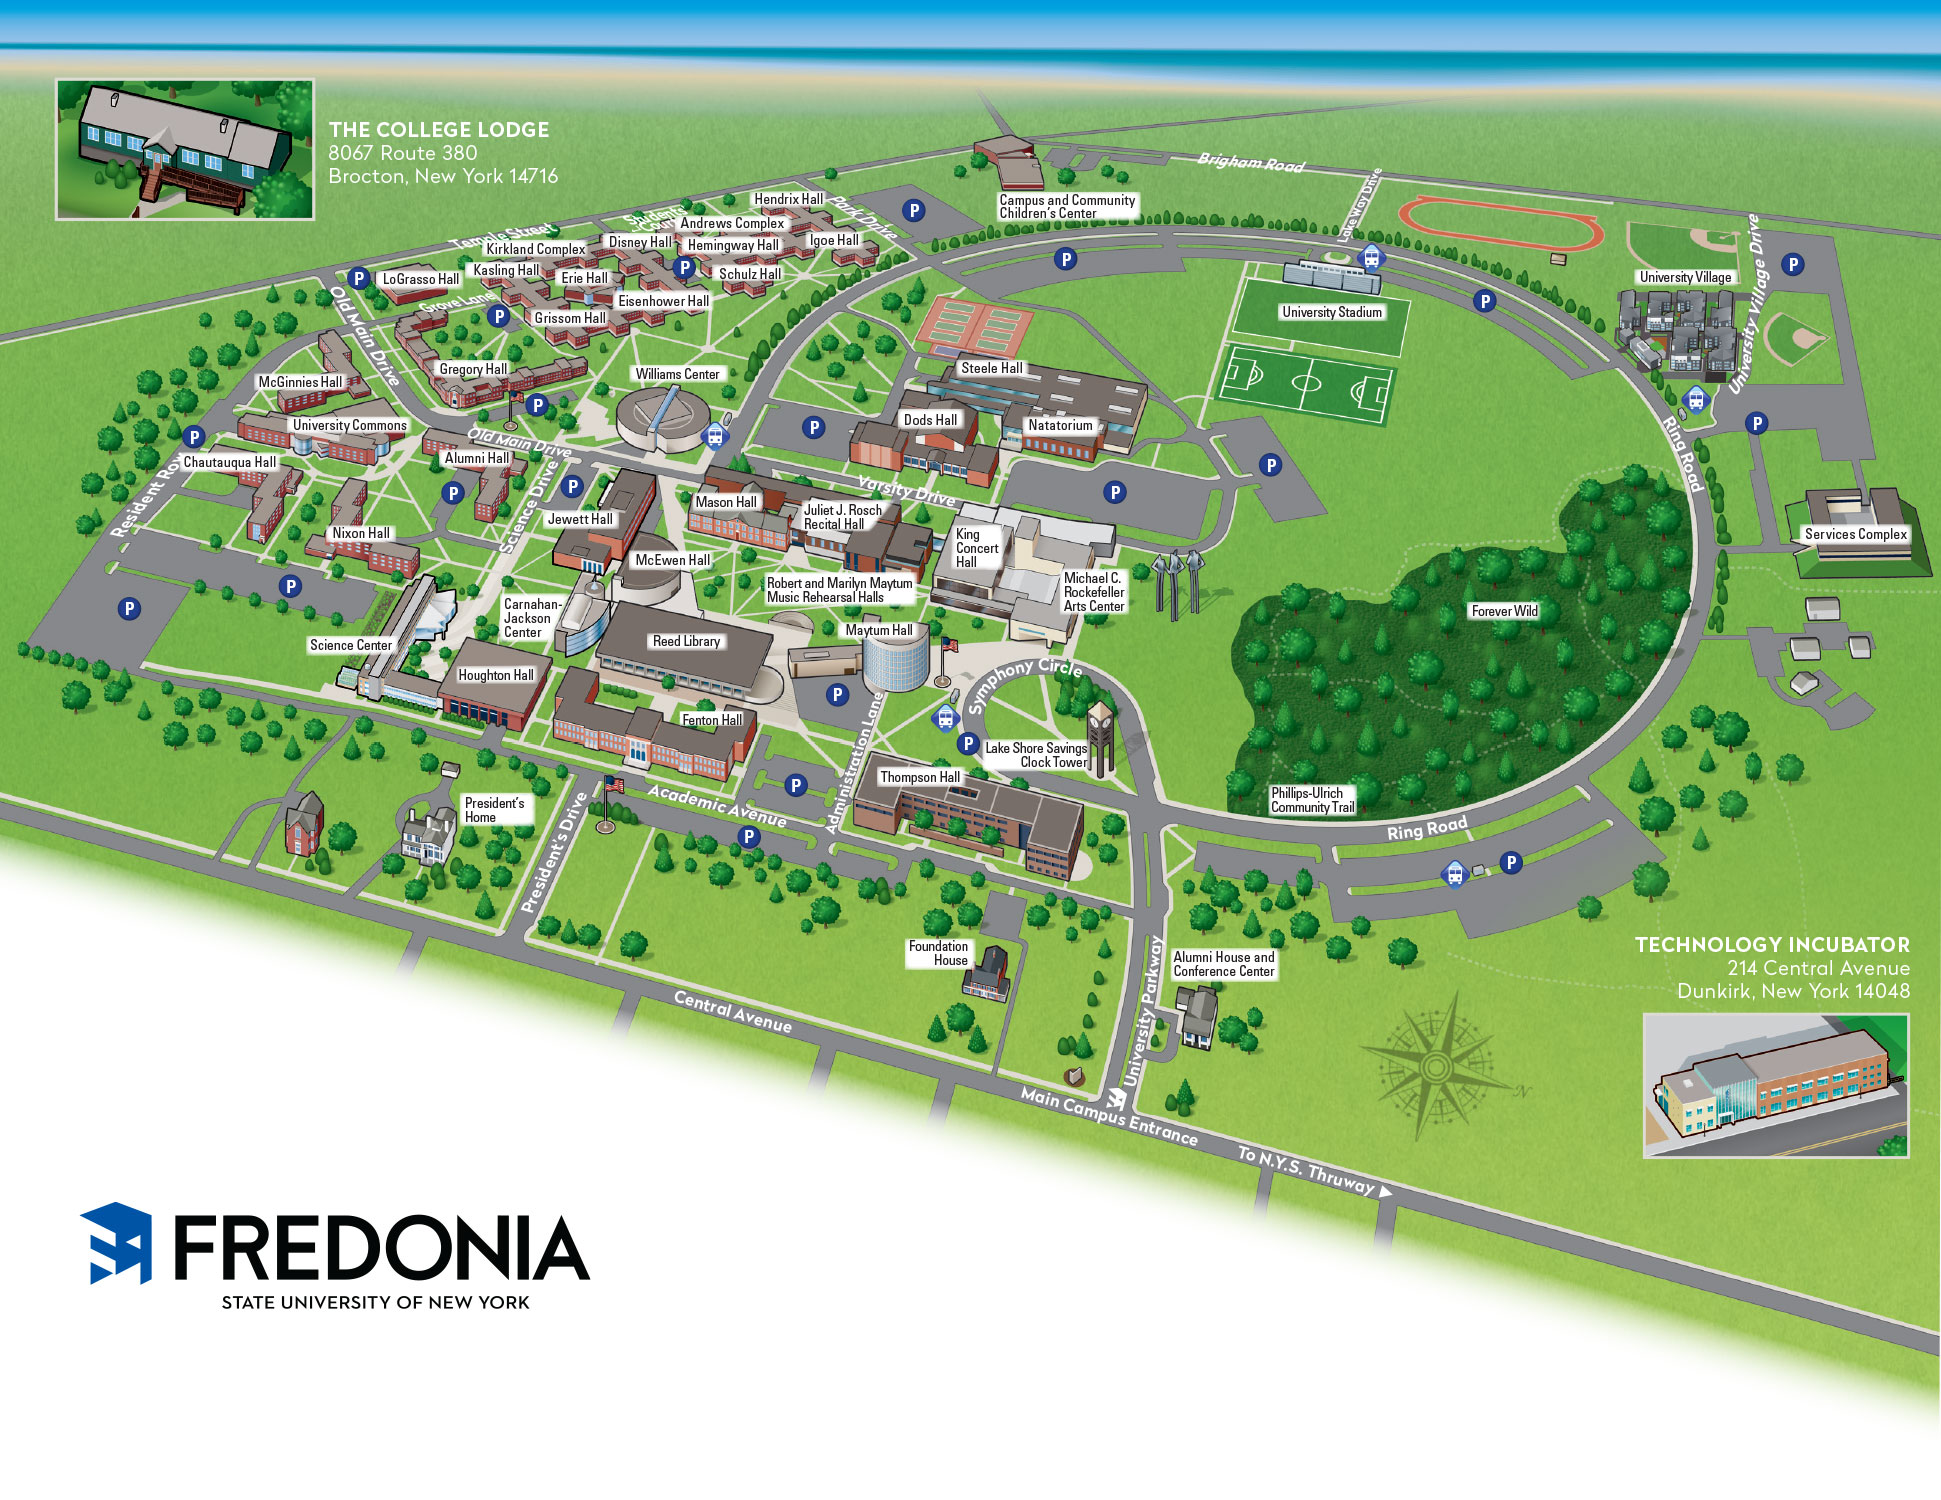 Millikin Campus Map.University Capus Map Campus Map Texas A M University Corpus Christi